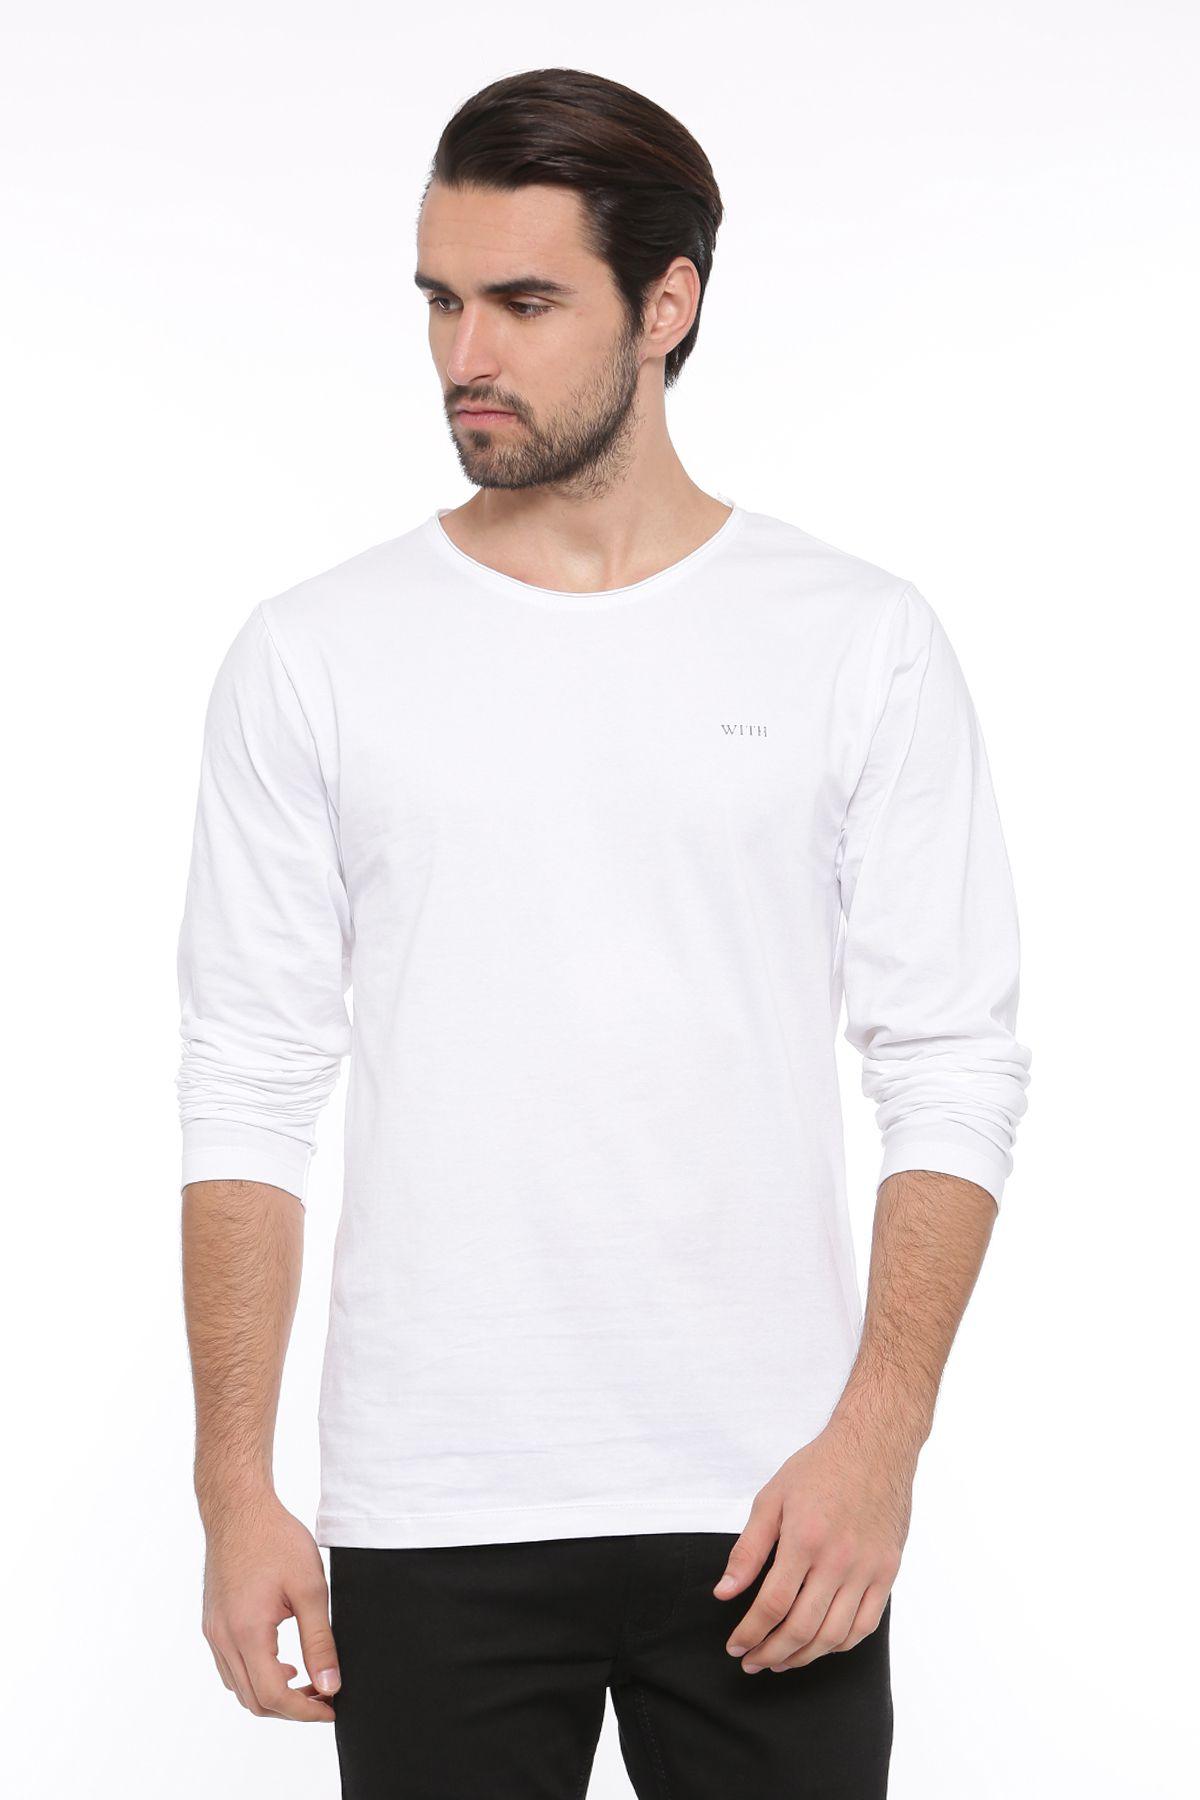 SHOWOFF White Round T-Shirt